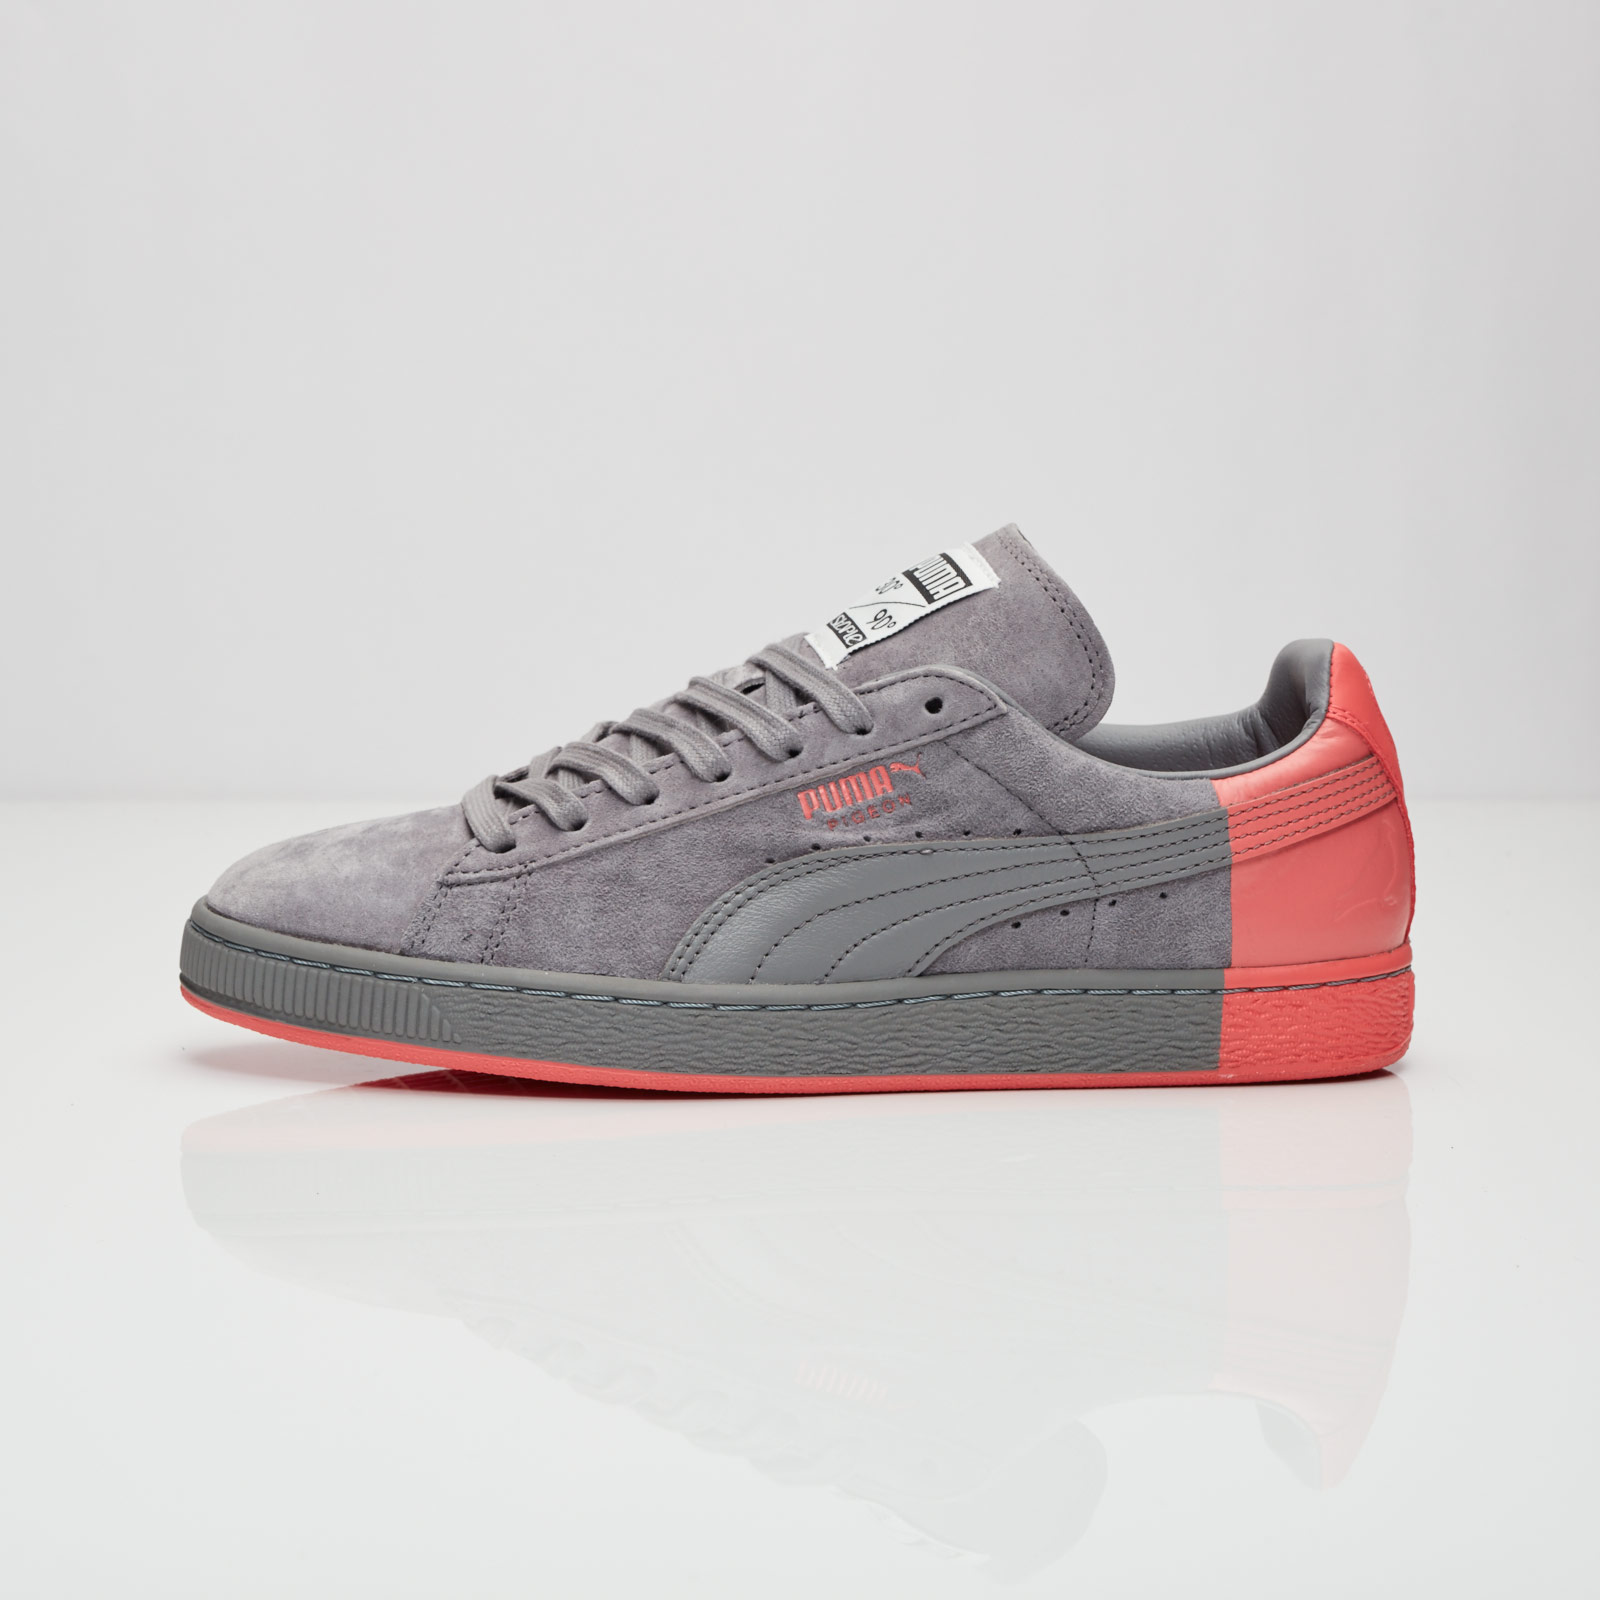 6ec5478b35e736 Puma Suede x Staple - 361617-03 - Sneakersnstuff